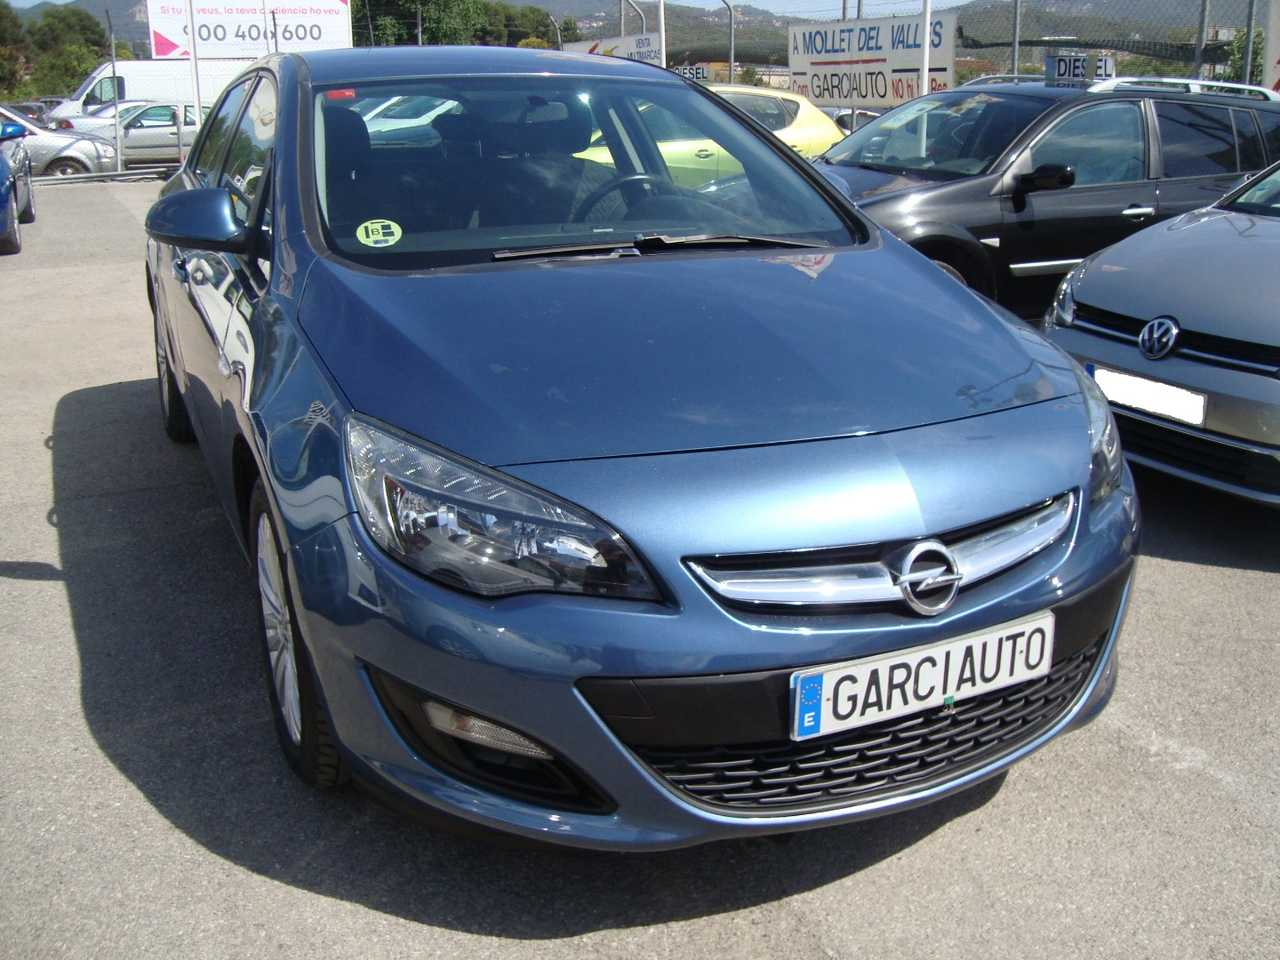 Opel Astra ASTRA 1.7 CDTI 110 CV ENJOY 5P   - Foto 1